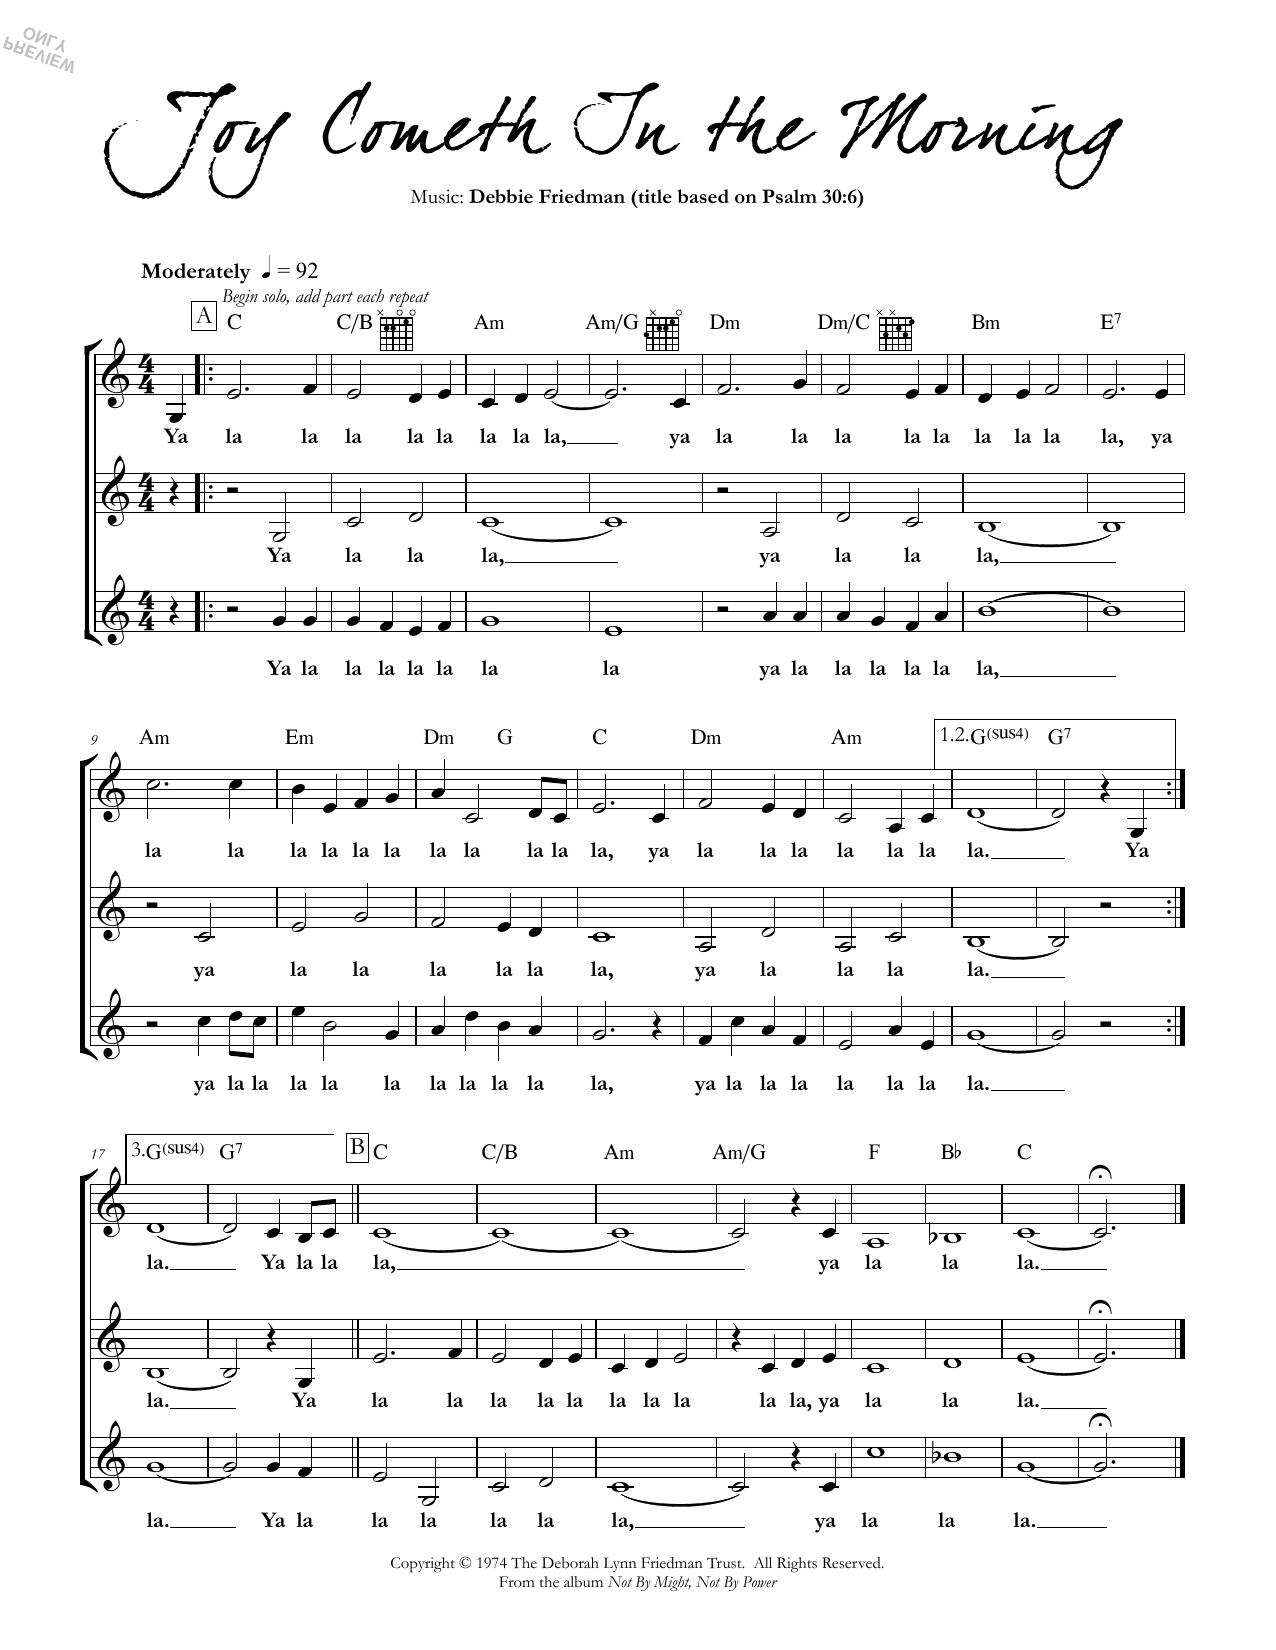 Joy Cometh In the Morning Sheet Music